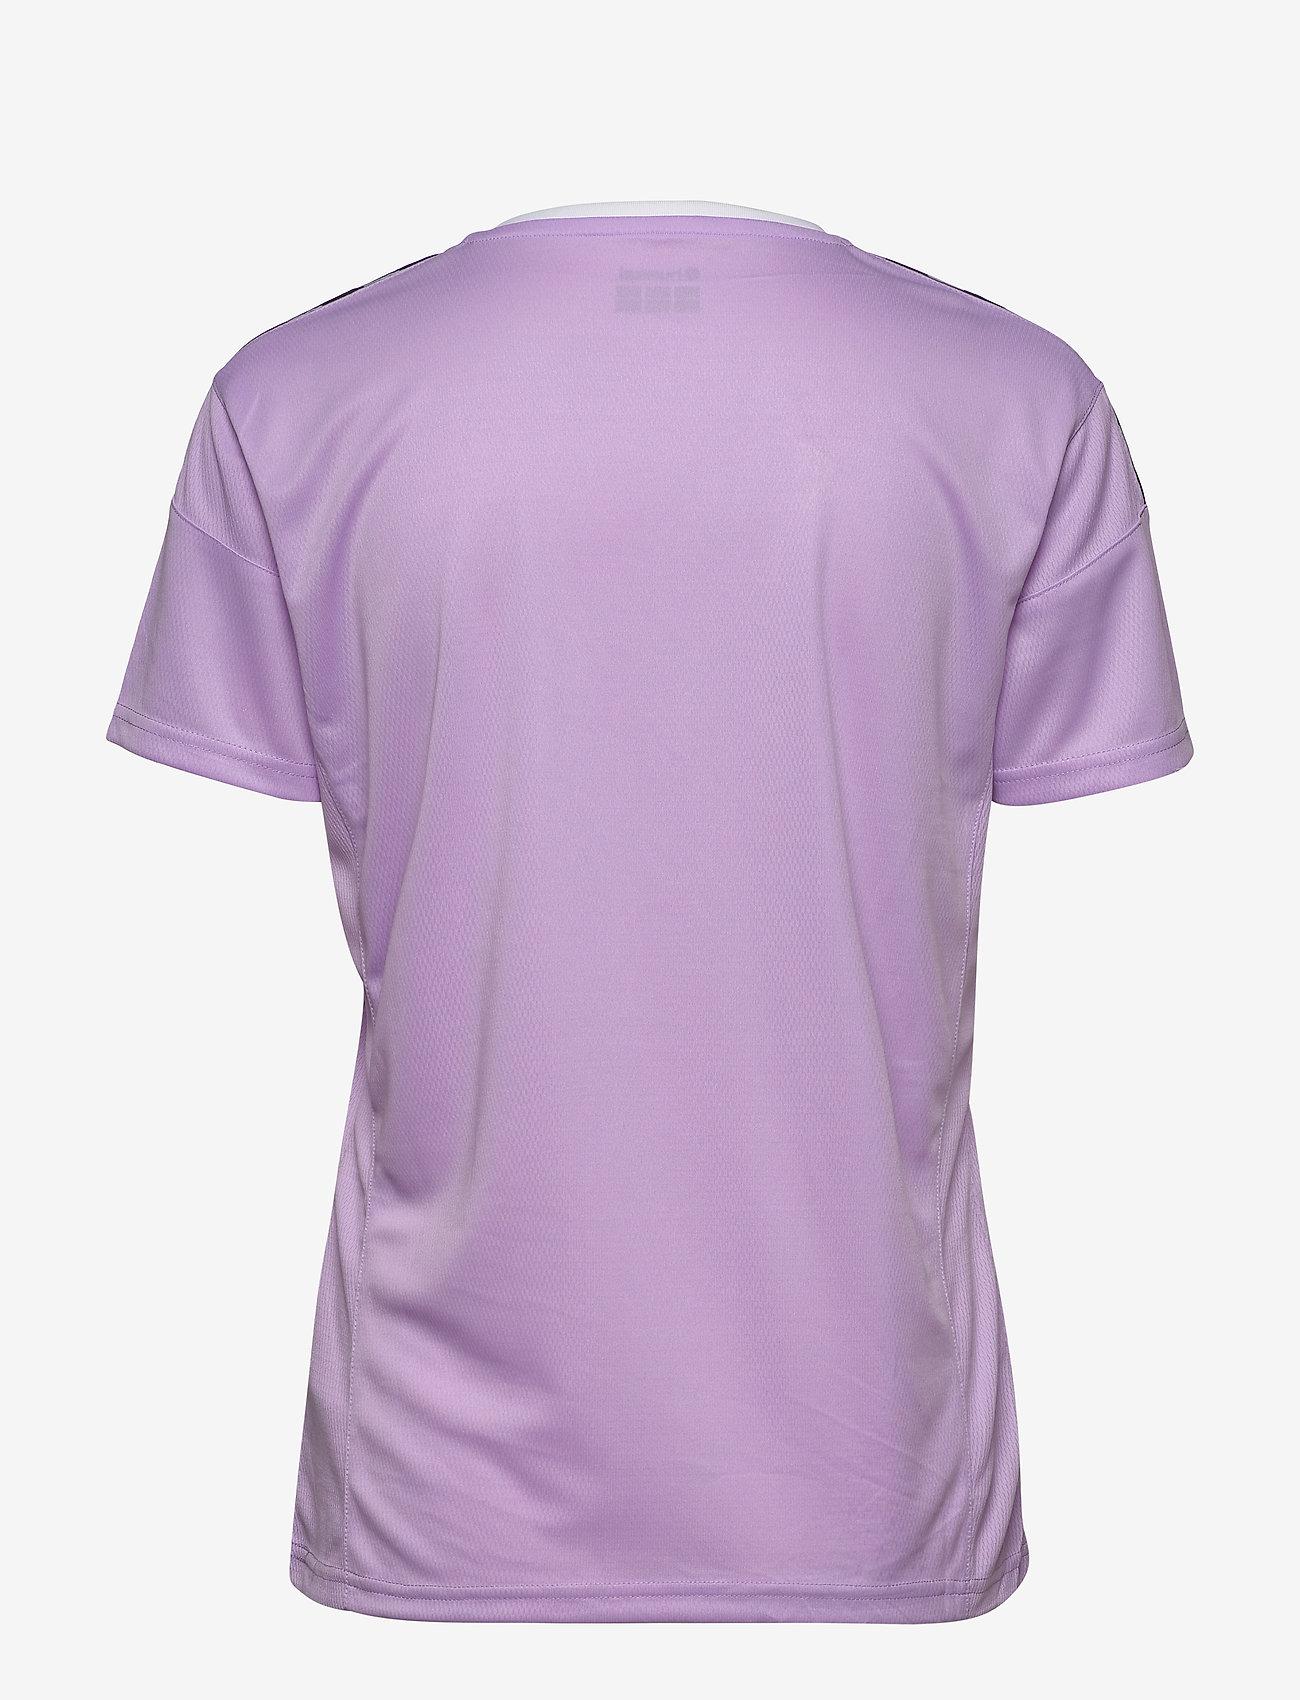 Hummel - hmlAUTHENTIC POLY JERSEY WOMAN S/S - t-shirts - lavendula - 1